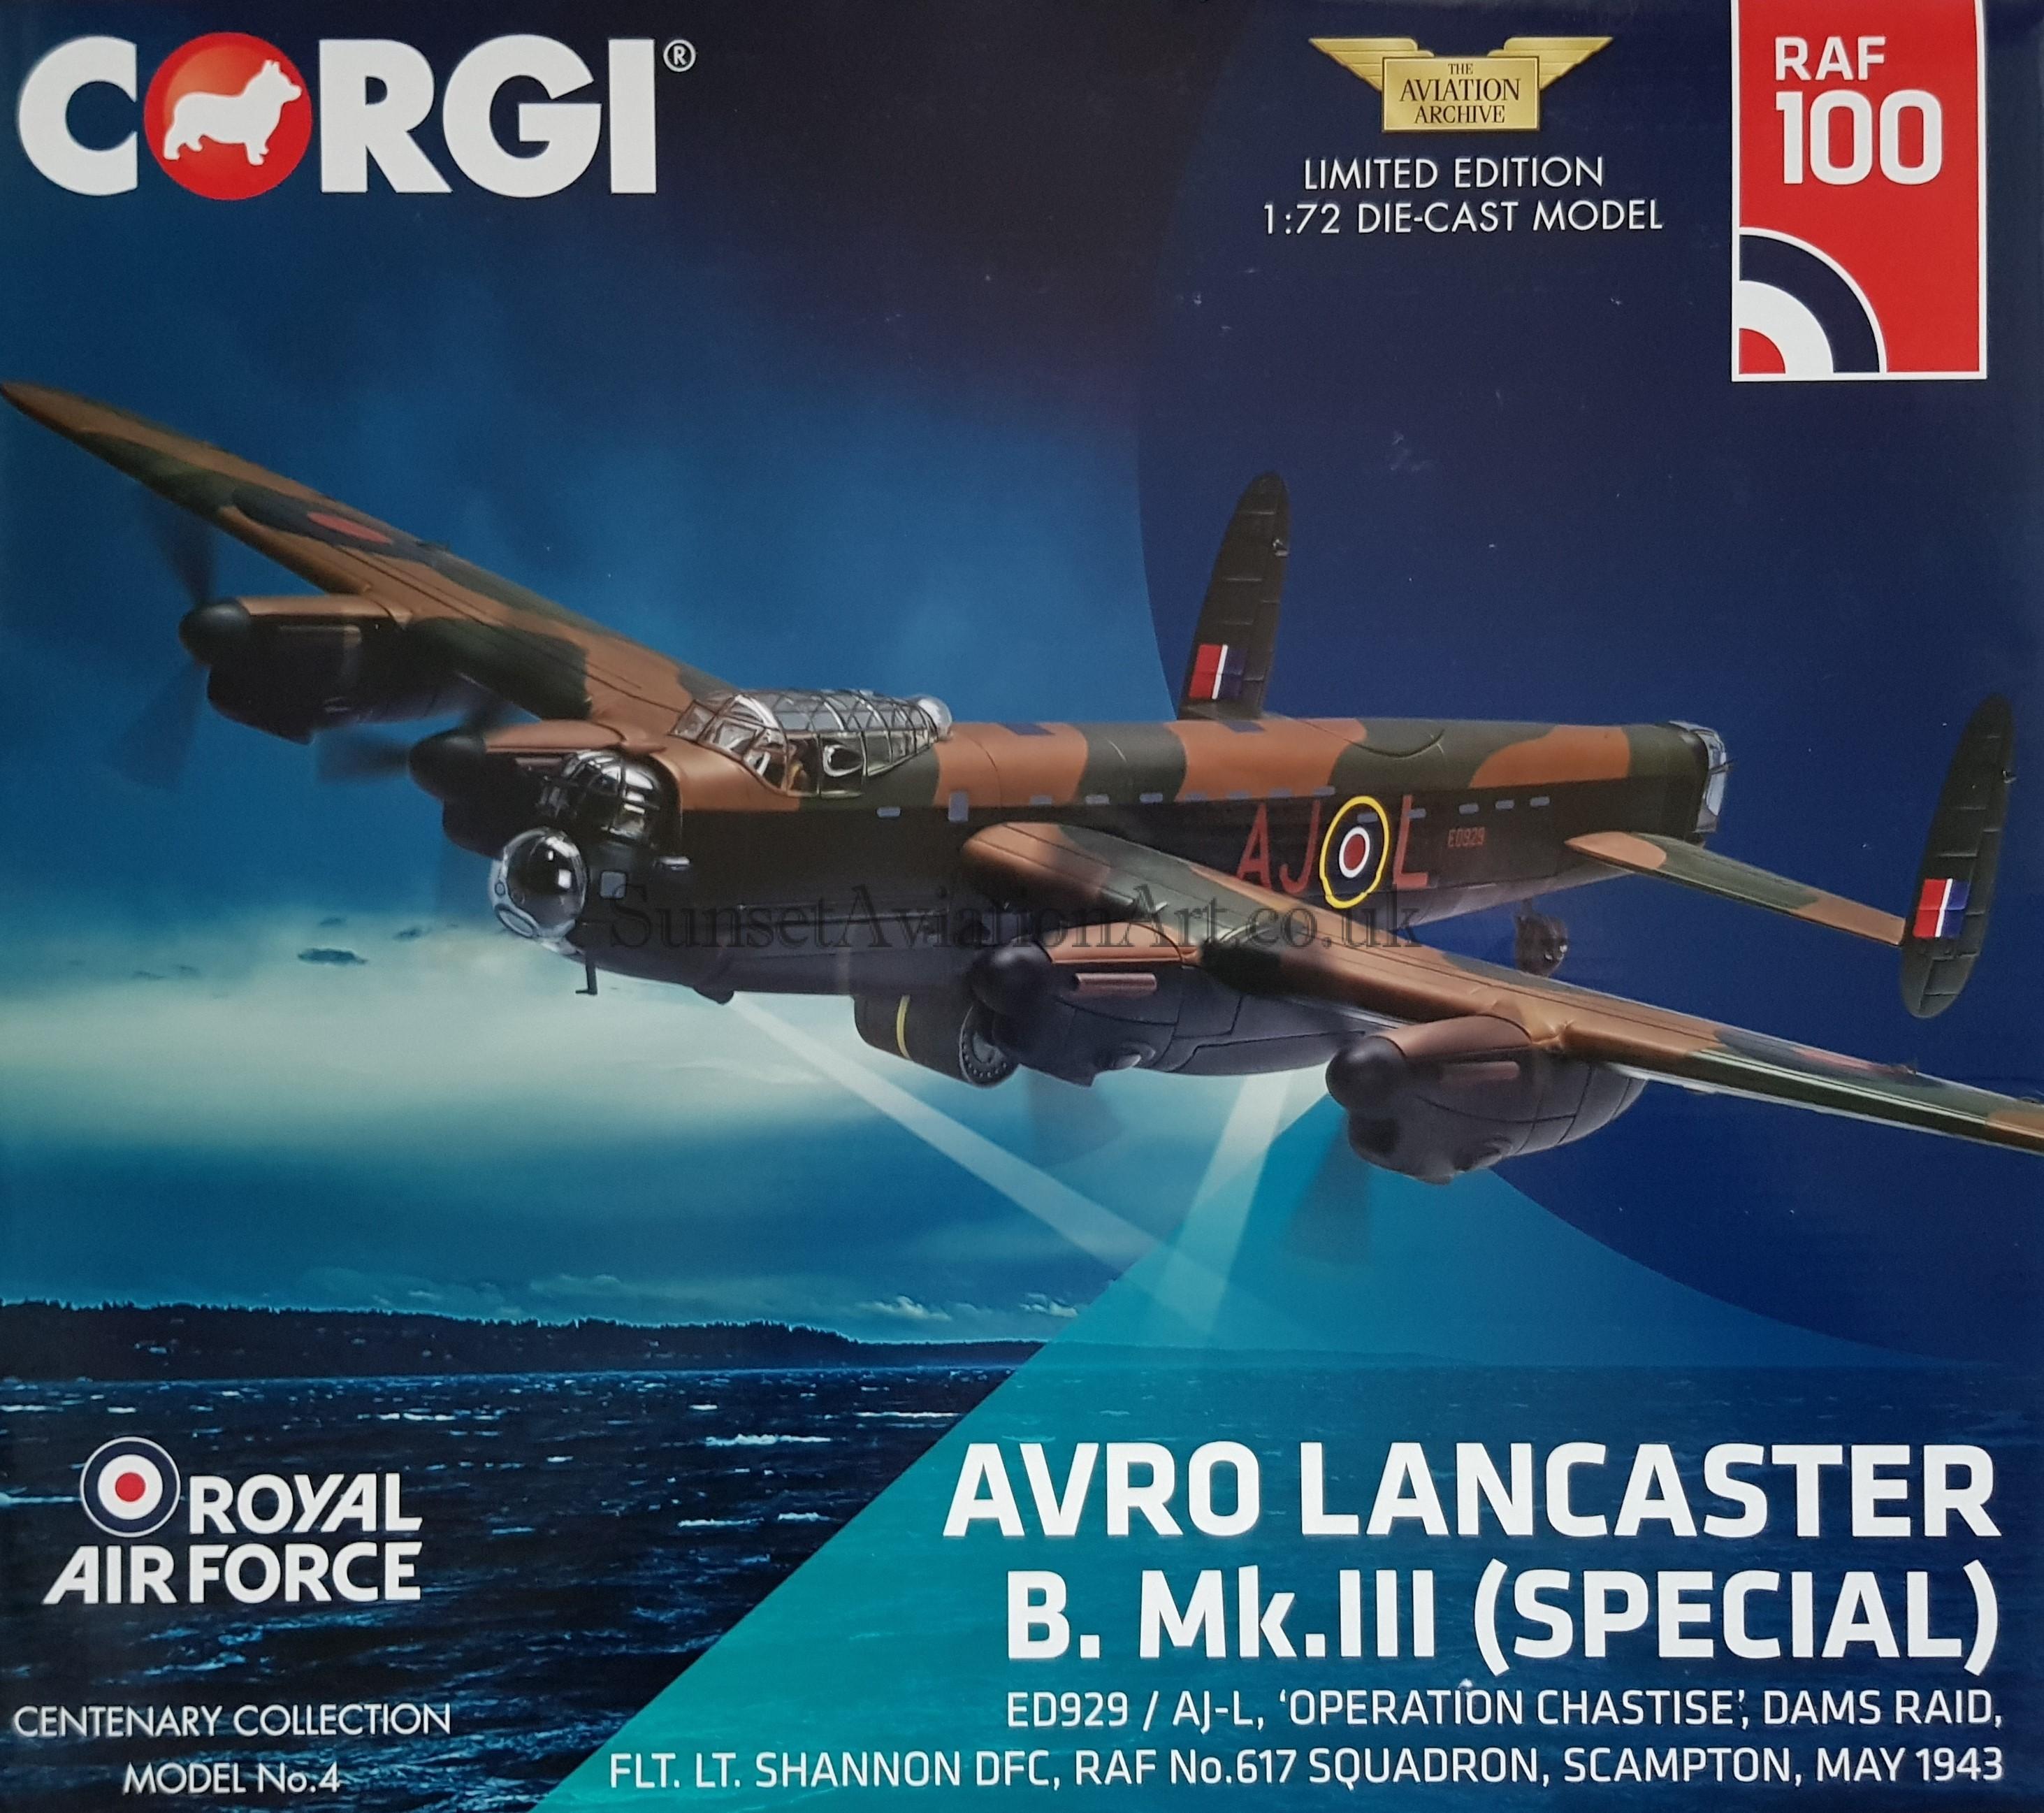 May 1943 1:72 Die-Cast Airplane AA32625 Corgi Avro Lancaster B Mk.III Special